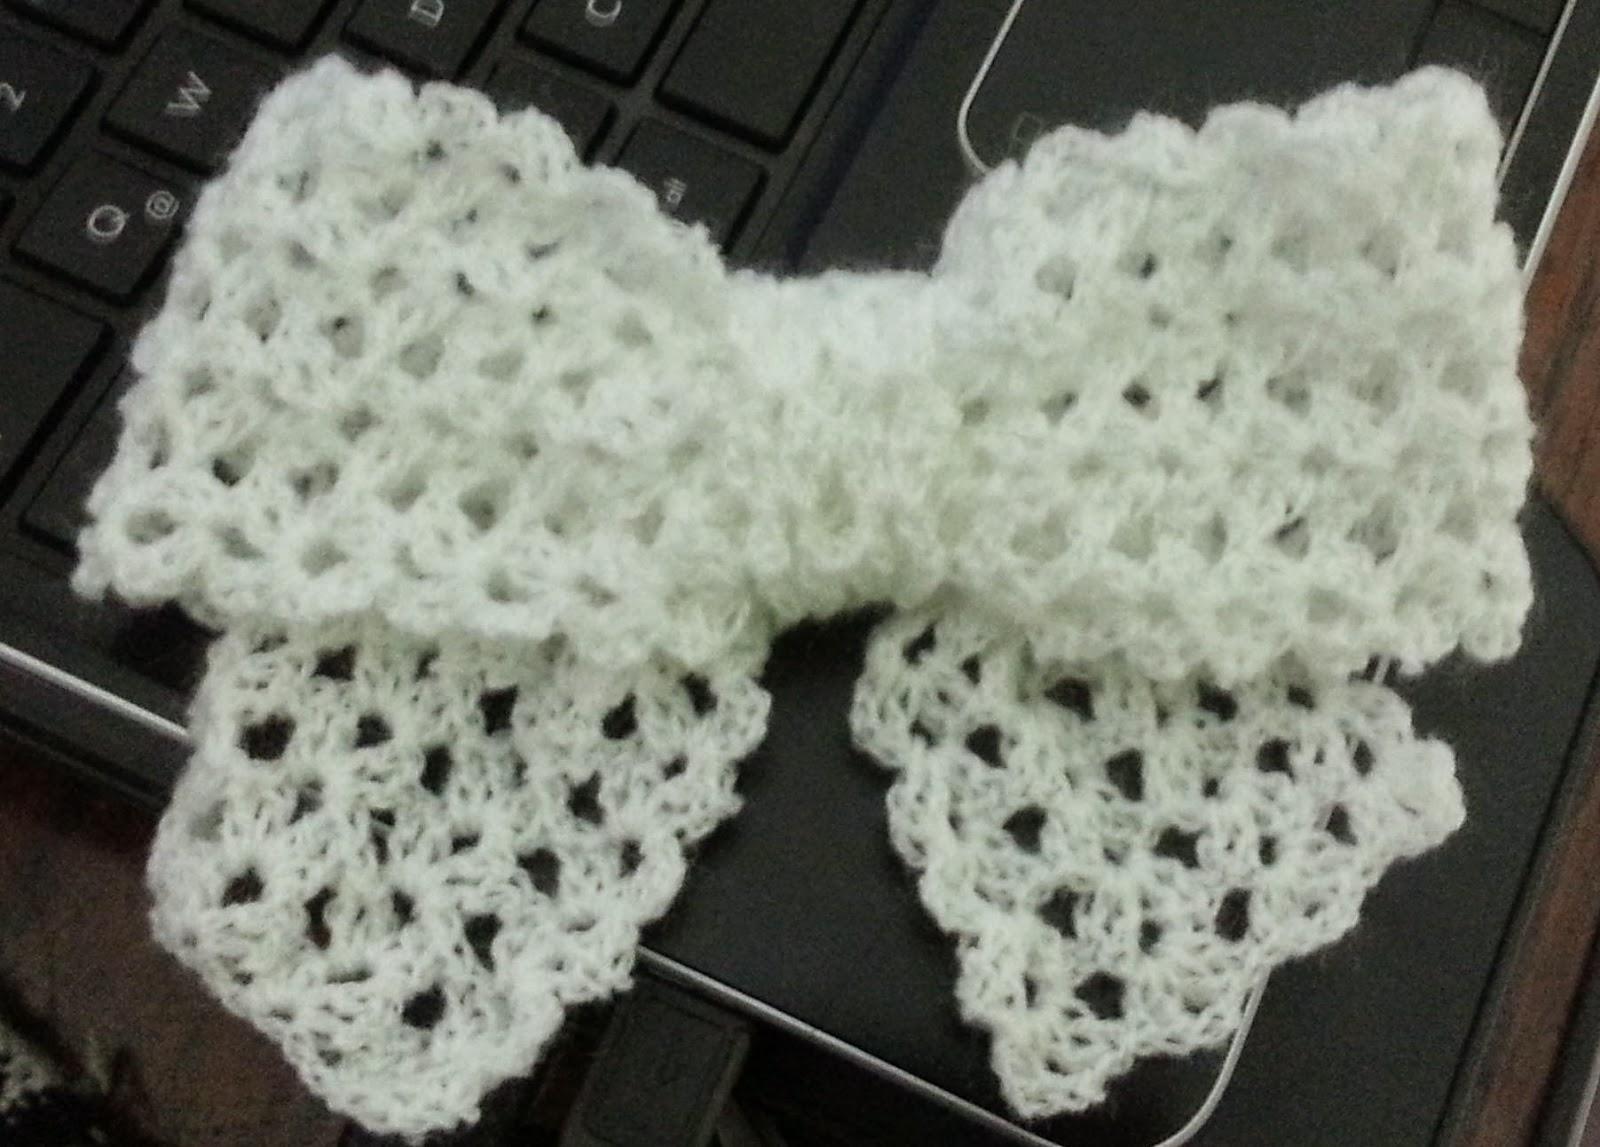 Manualidades Sencillas: Lazo a crochet